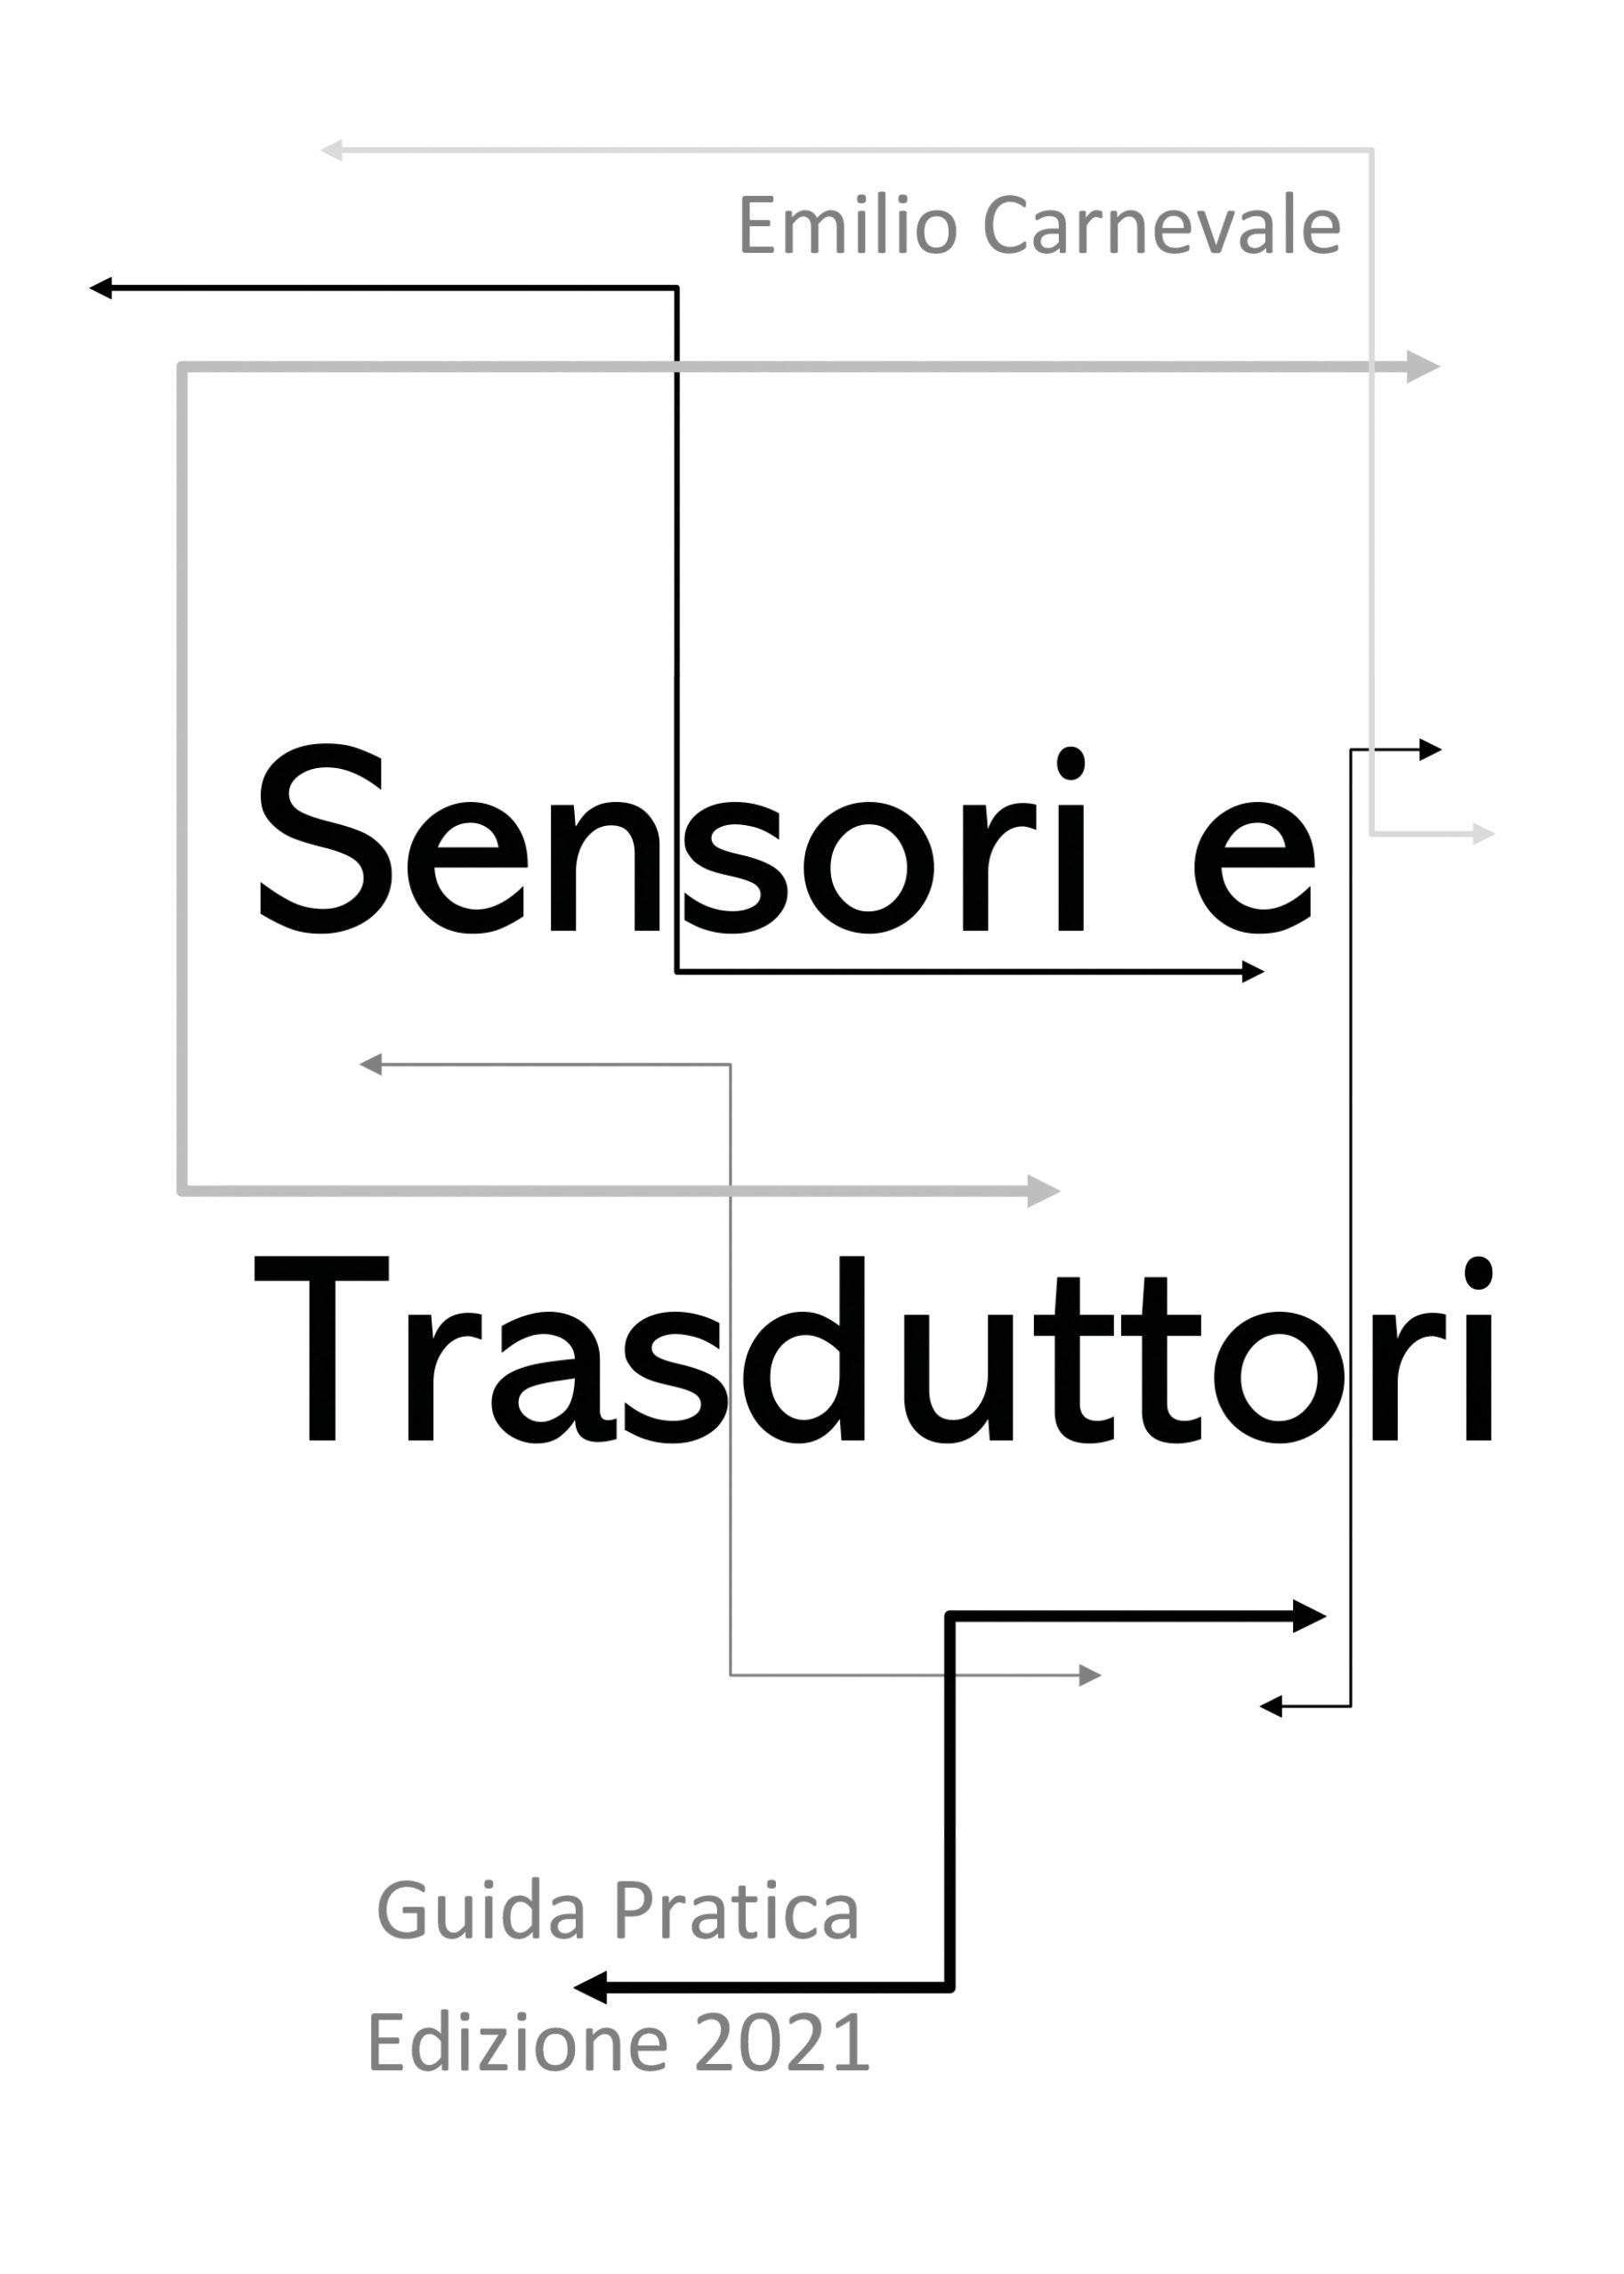 Sensori e trasduttori. Guida pratica Edizione 2021